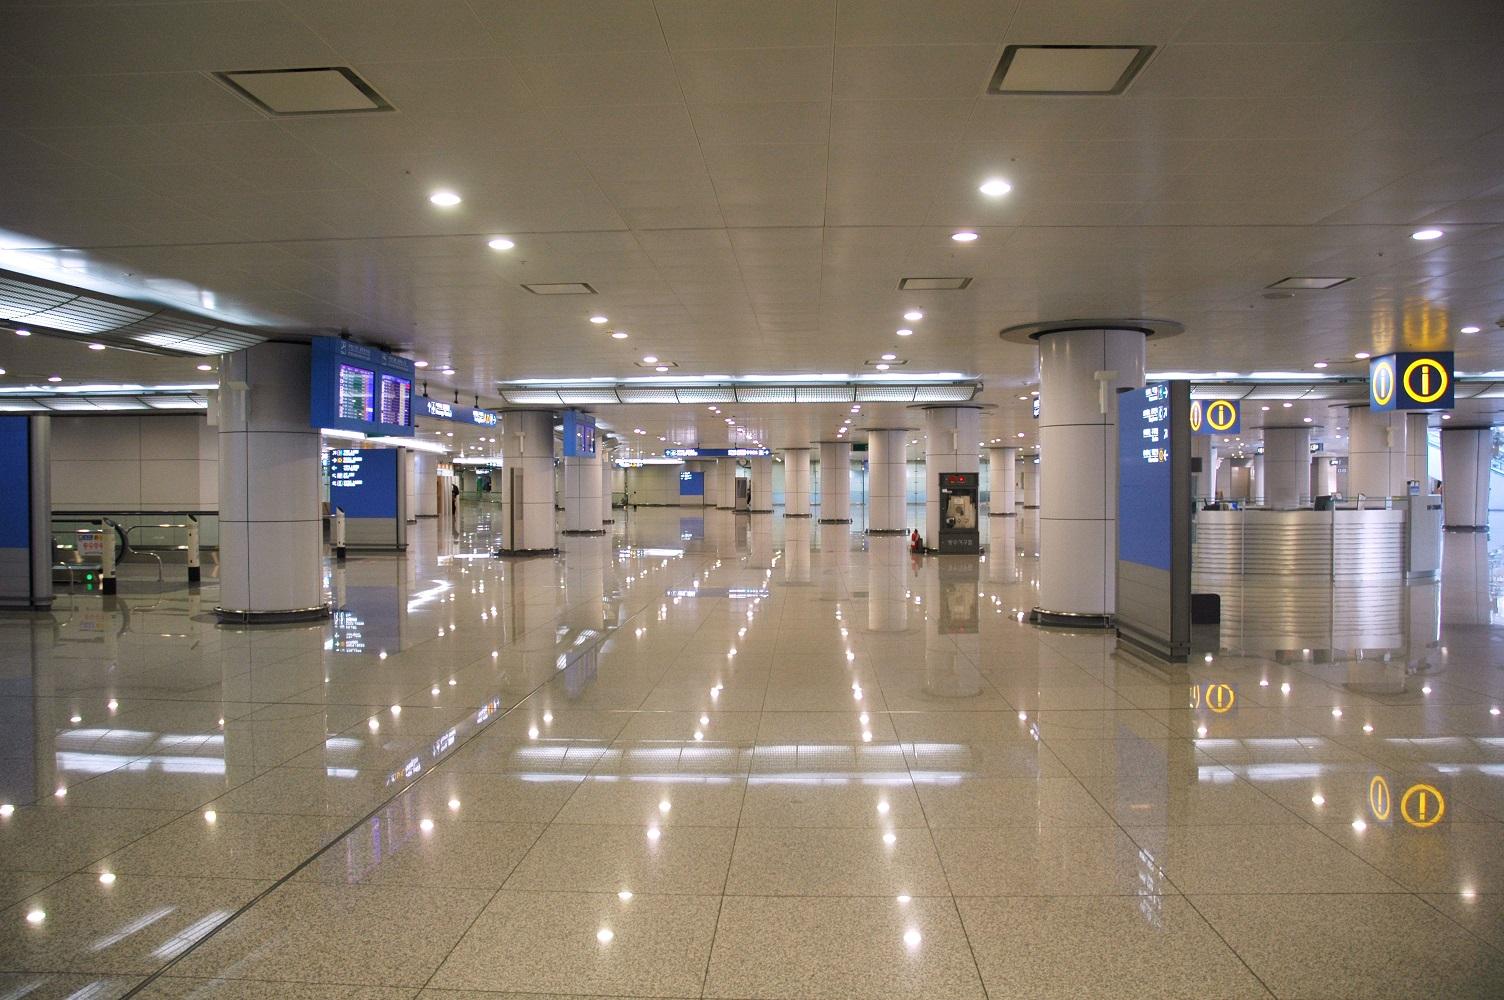 Station-Ground Handling Management